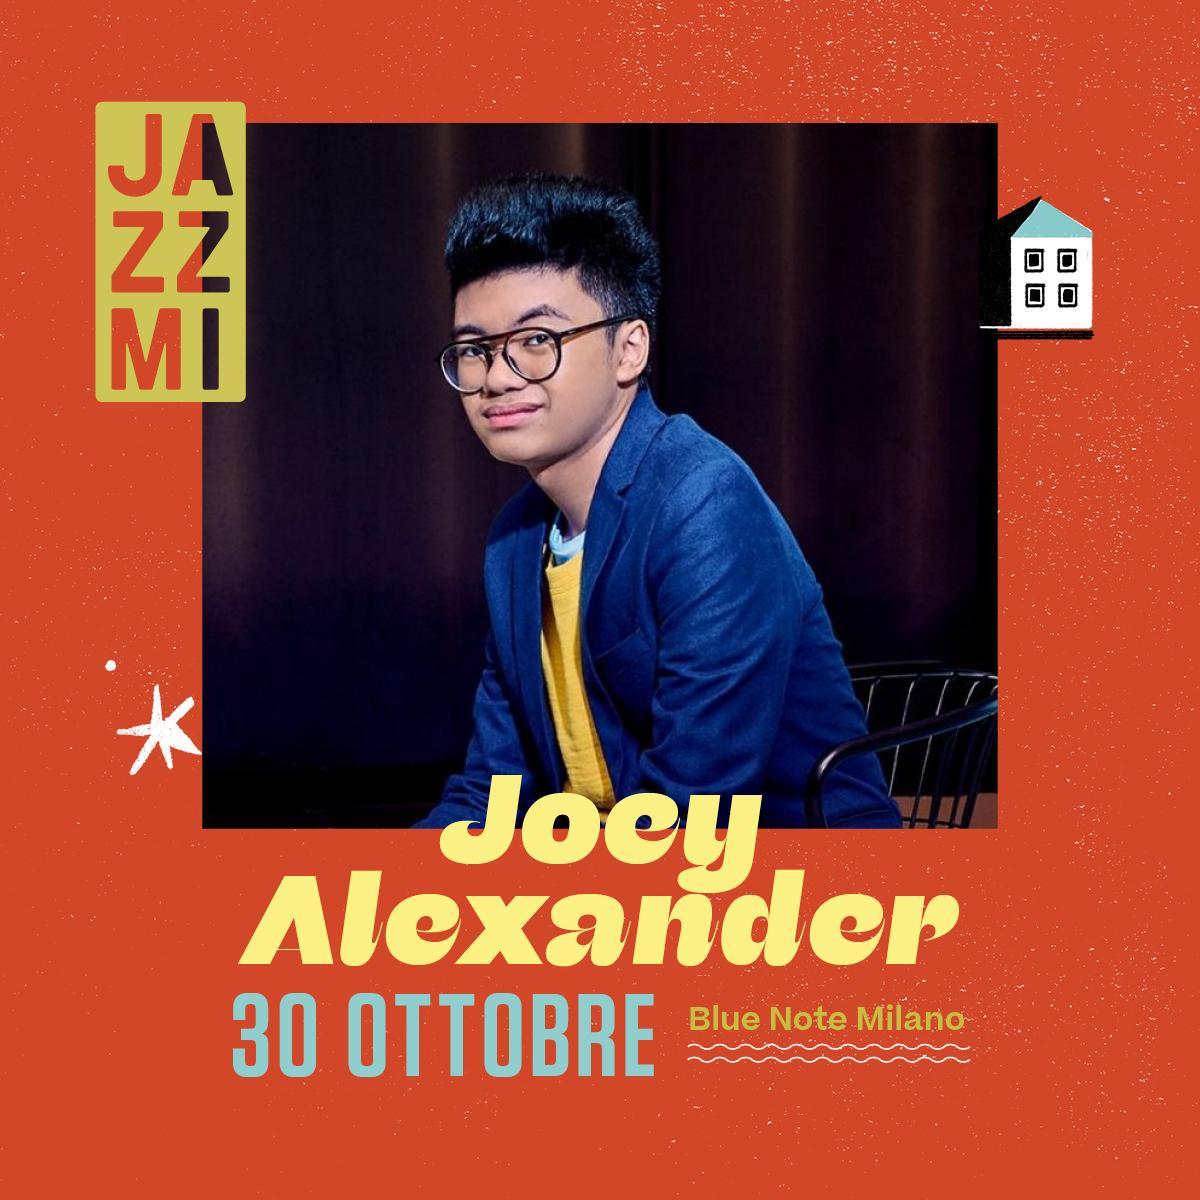 JAZZMI Joey Alexander 30/10/2021 23.00